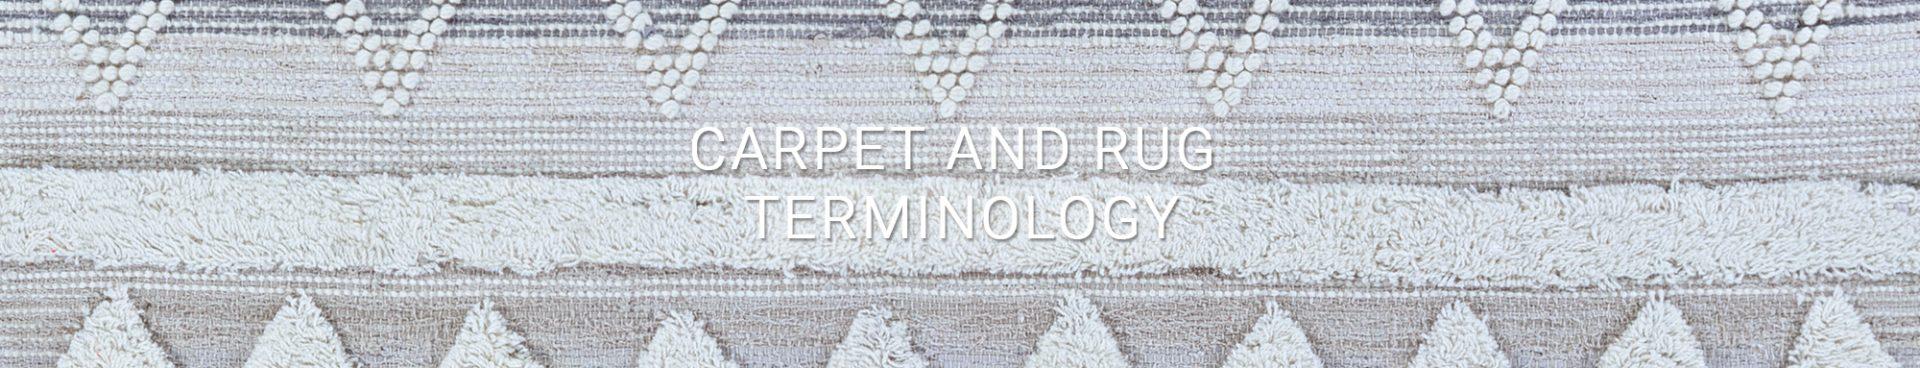 Carpet & Rug Terminology - Couristan